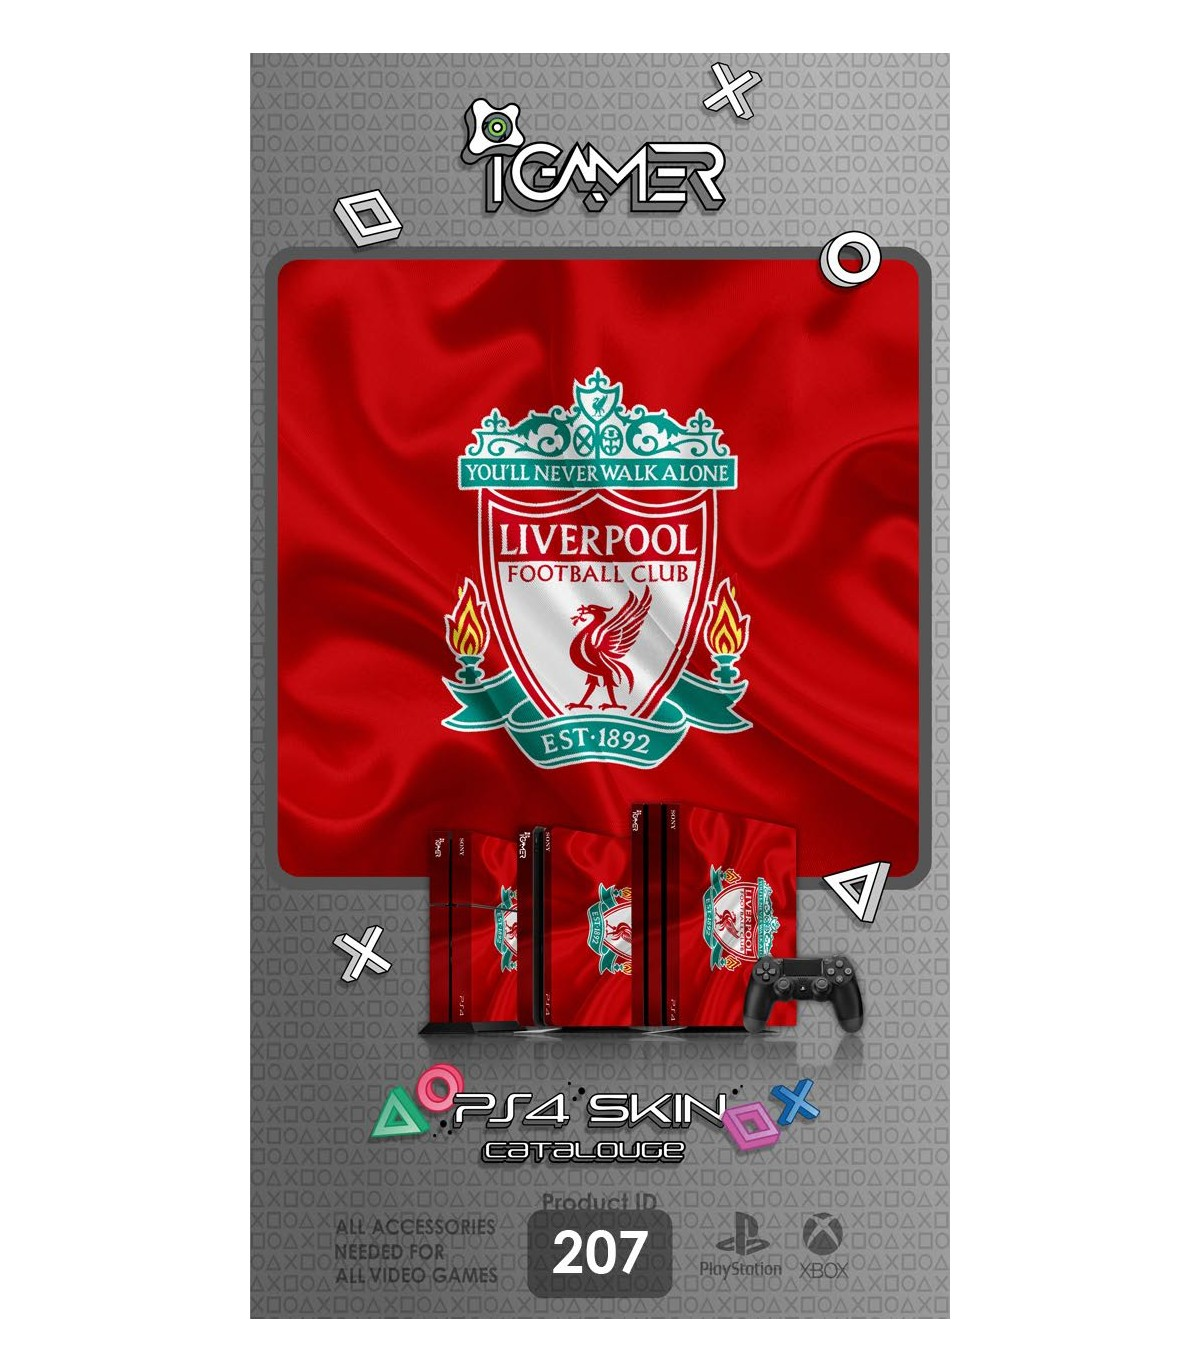 اسکین PS4 آی گیمر طرح Liverpool